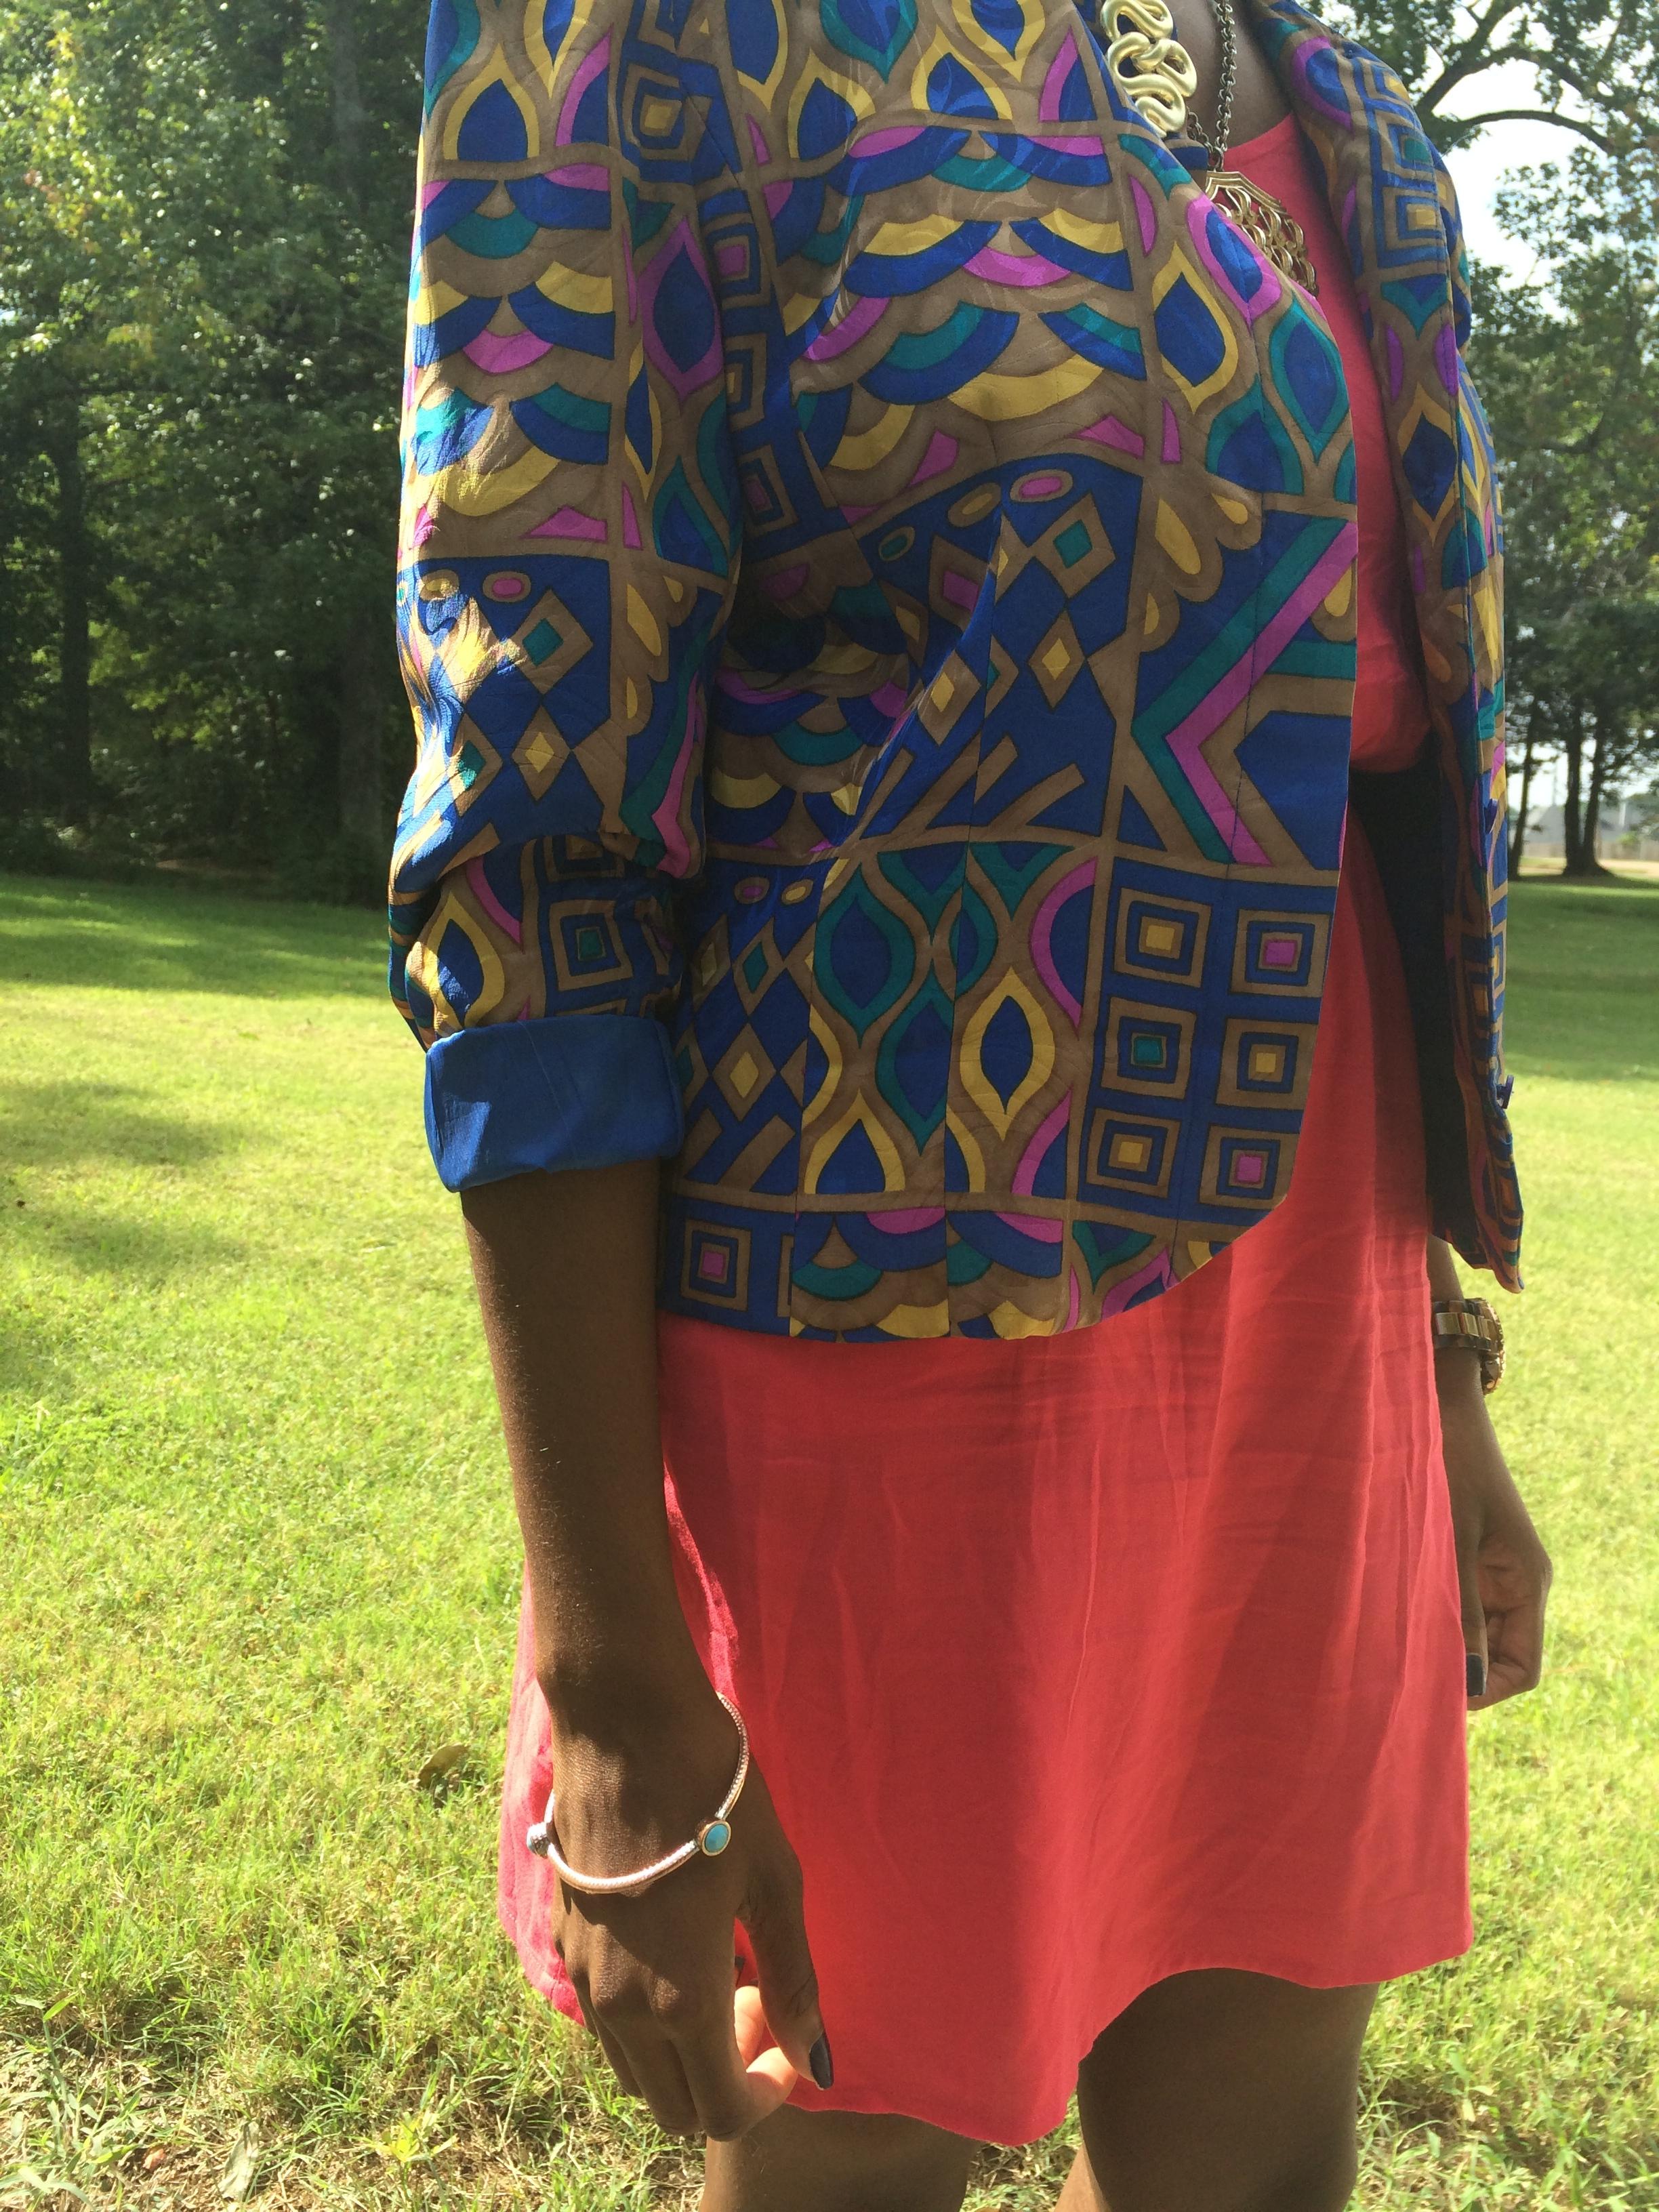 outfit deets: dress - Target; blazer - thrifted vintage; shoes & watch - Michael Kors; necklace, earrings & bracelet - vintage